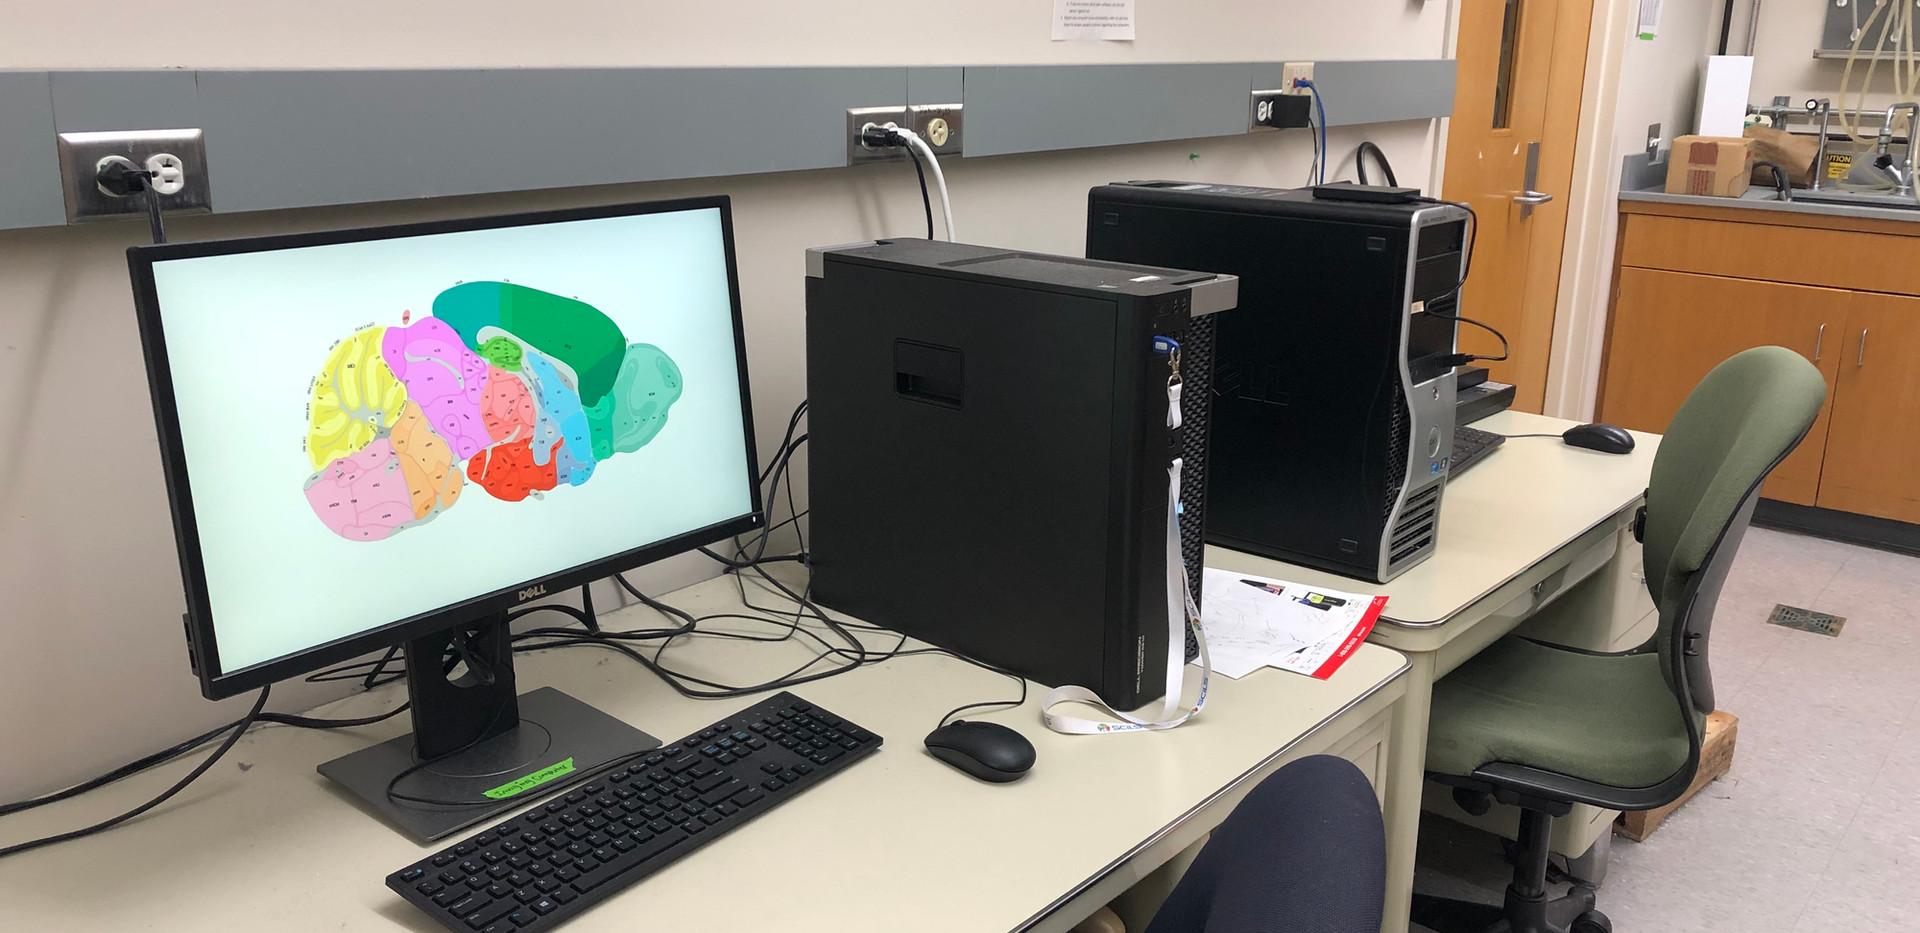 Workstations dedicated for MALDI analysis